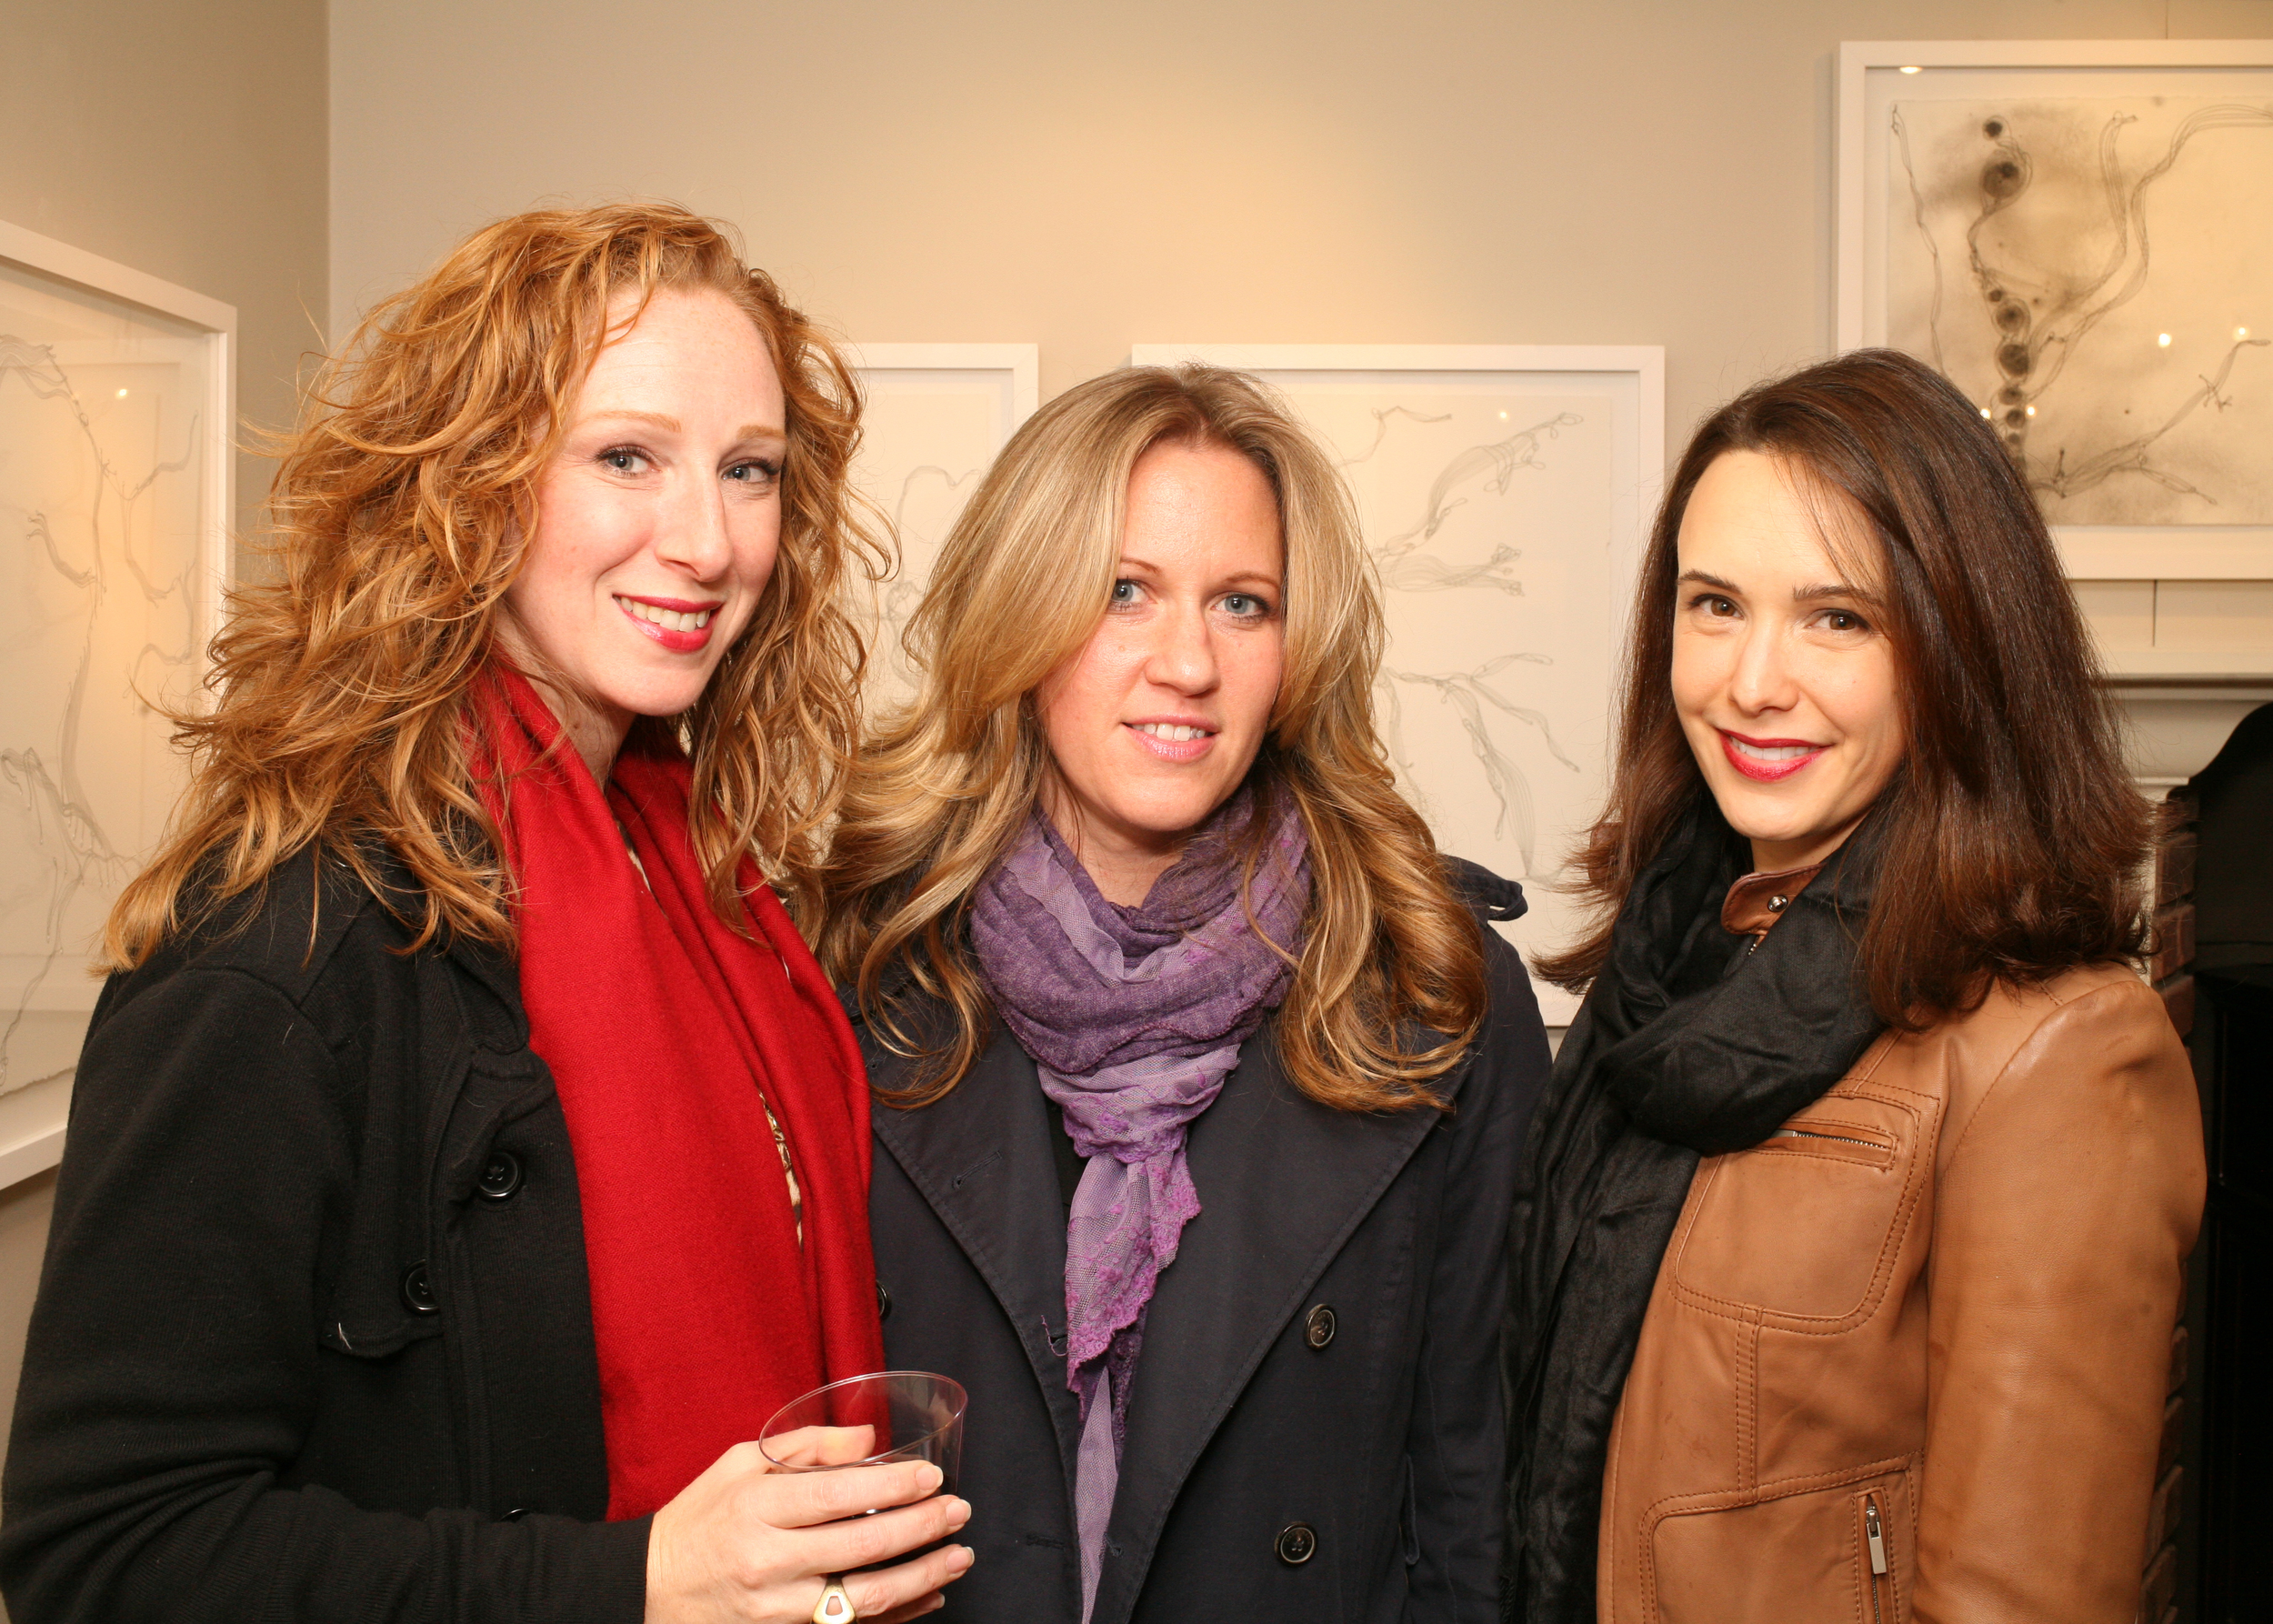 IMG_2450 Giovanna Giordano, Nicole Taylor, Lindsey Taylor.JPG